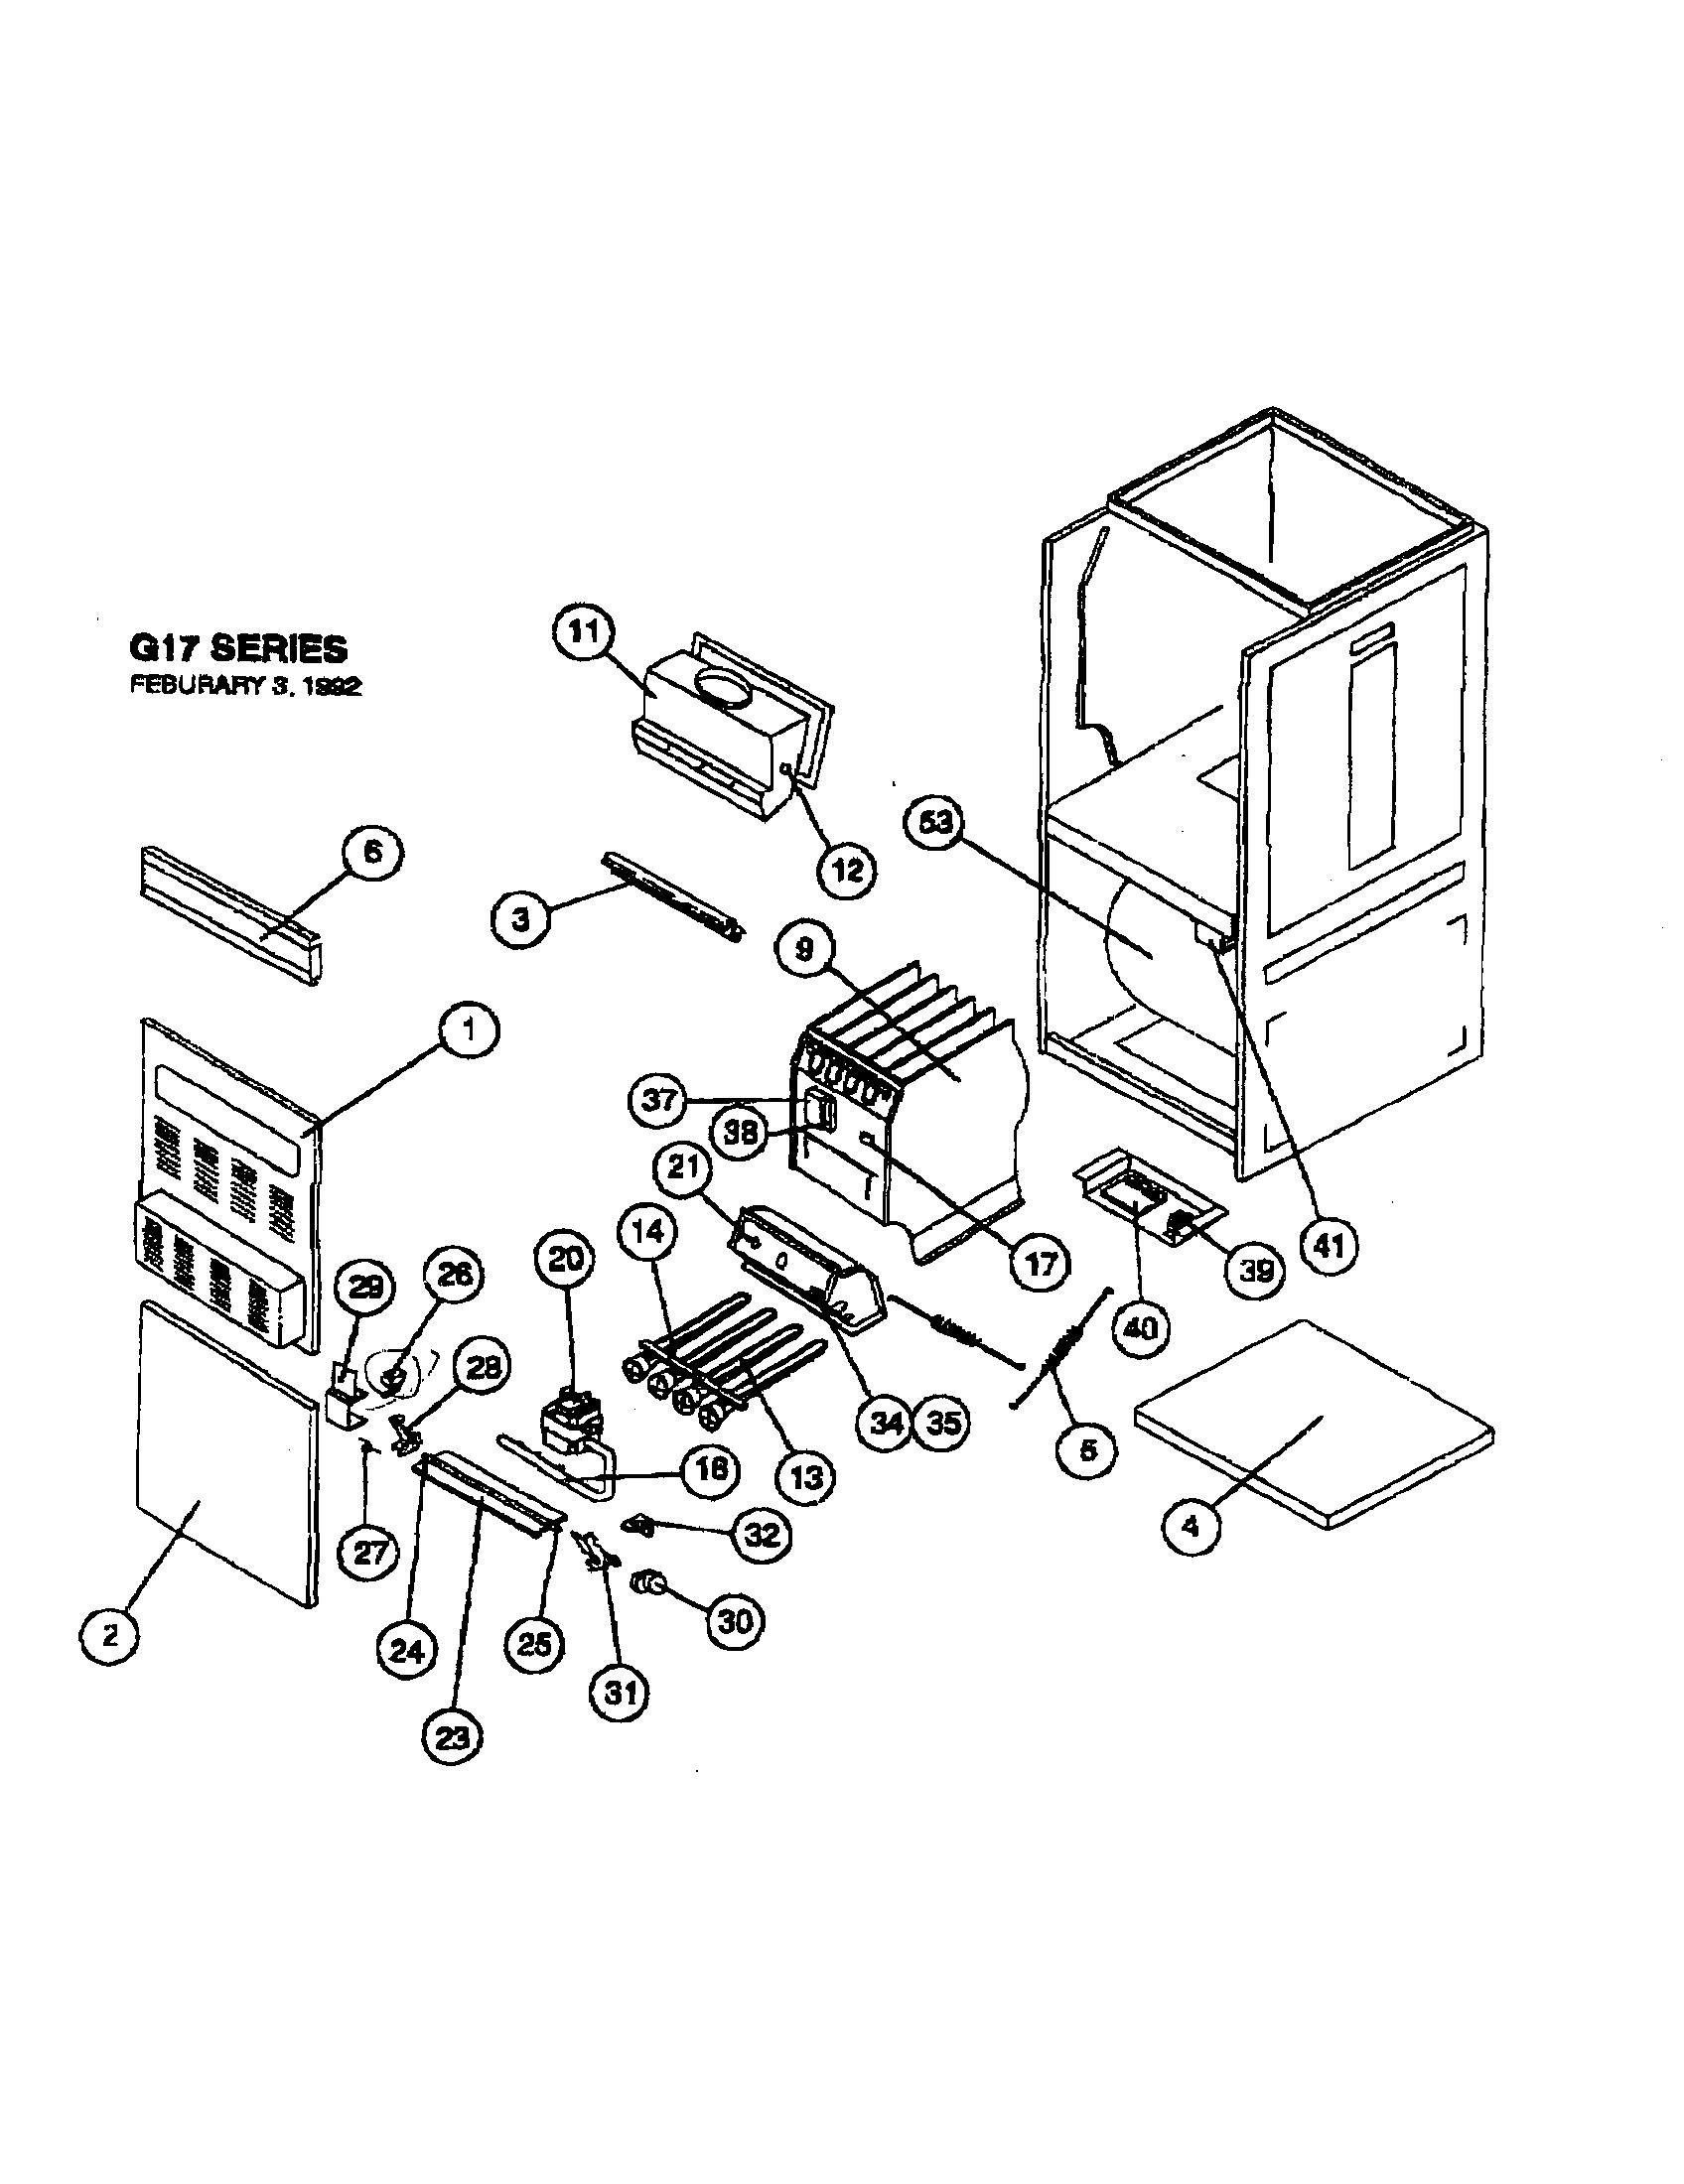 Lennox furnaces parts photos